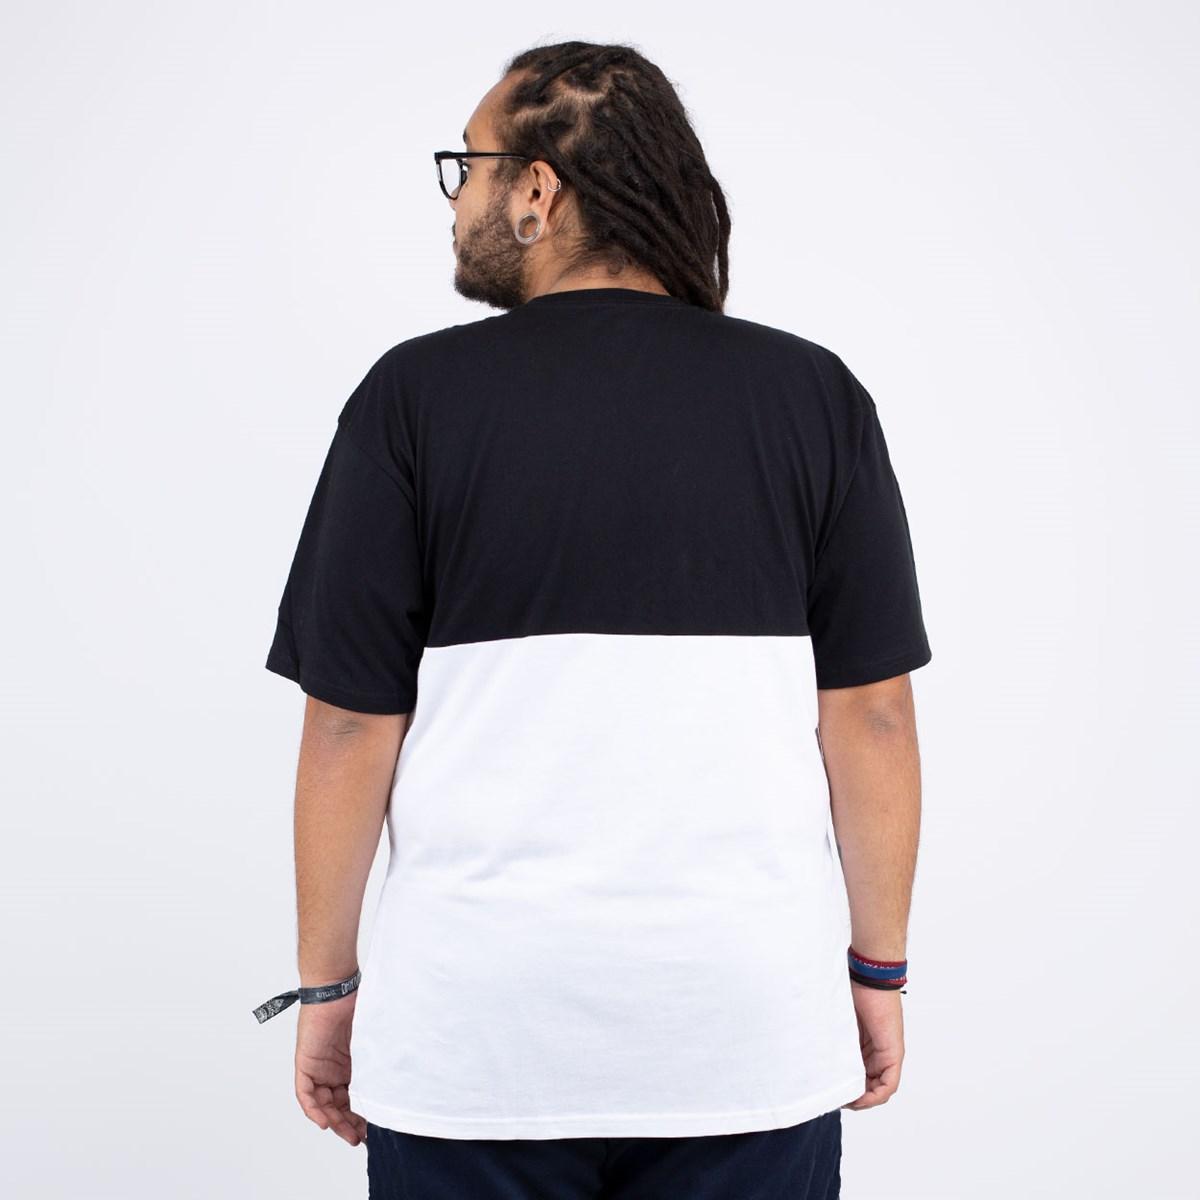 Camiseta Vans Colorblock Tee White Black VN0A3CZDYB2